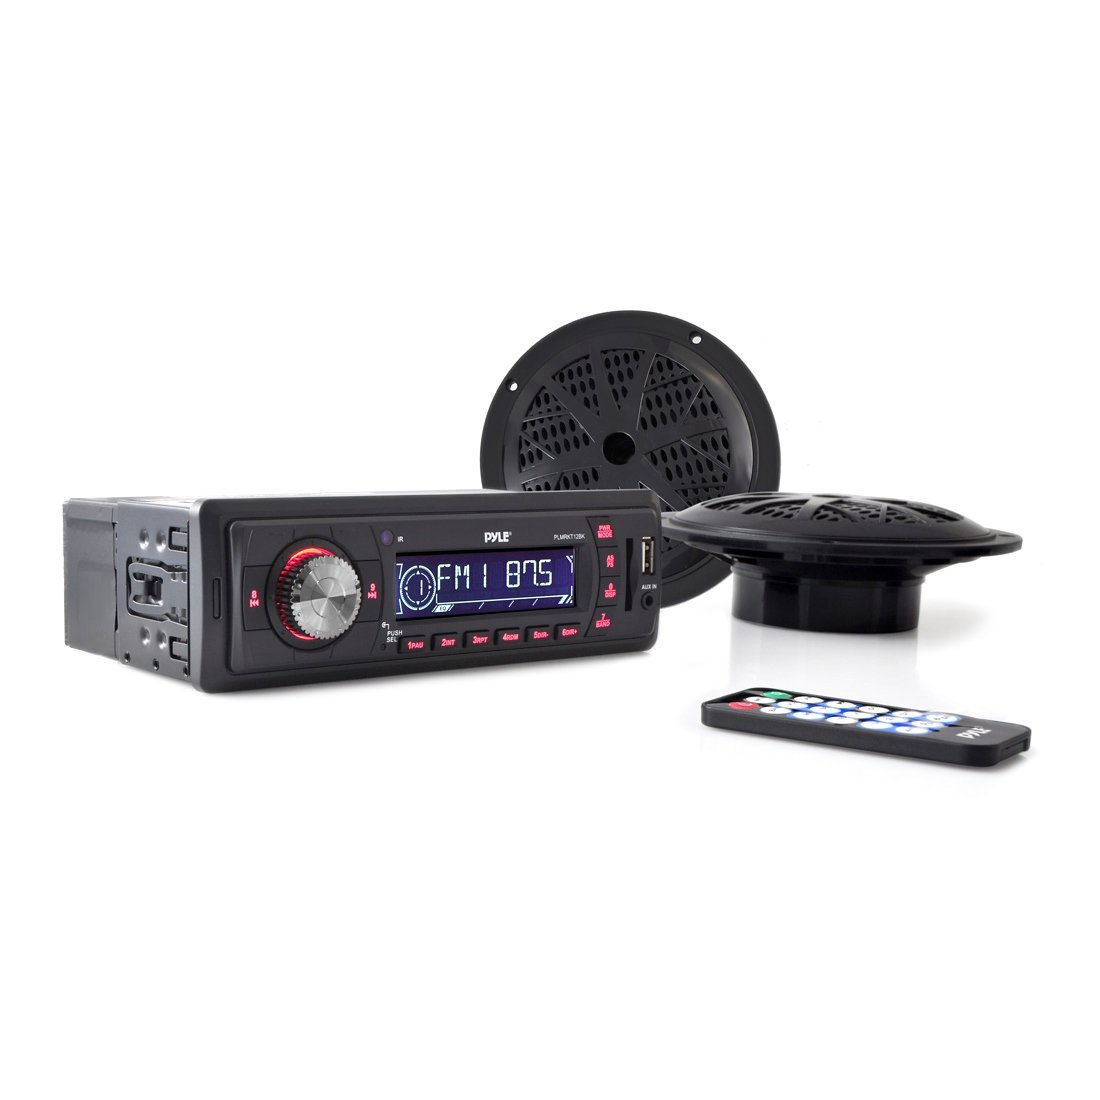 Marine Headunit Receiver Speaker Kit - In-Dash LCD Digital Stereo w/AM FM Radio System 5.25'' Waterproof Cone Speakers (2) MP3/USB/SD Readers Aux Input Single DIN & Remote Control - Pyle PLMRKT12BK